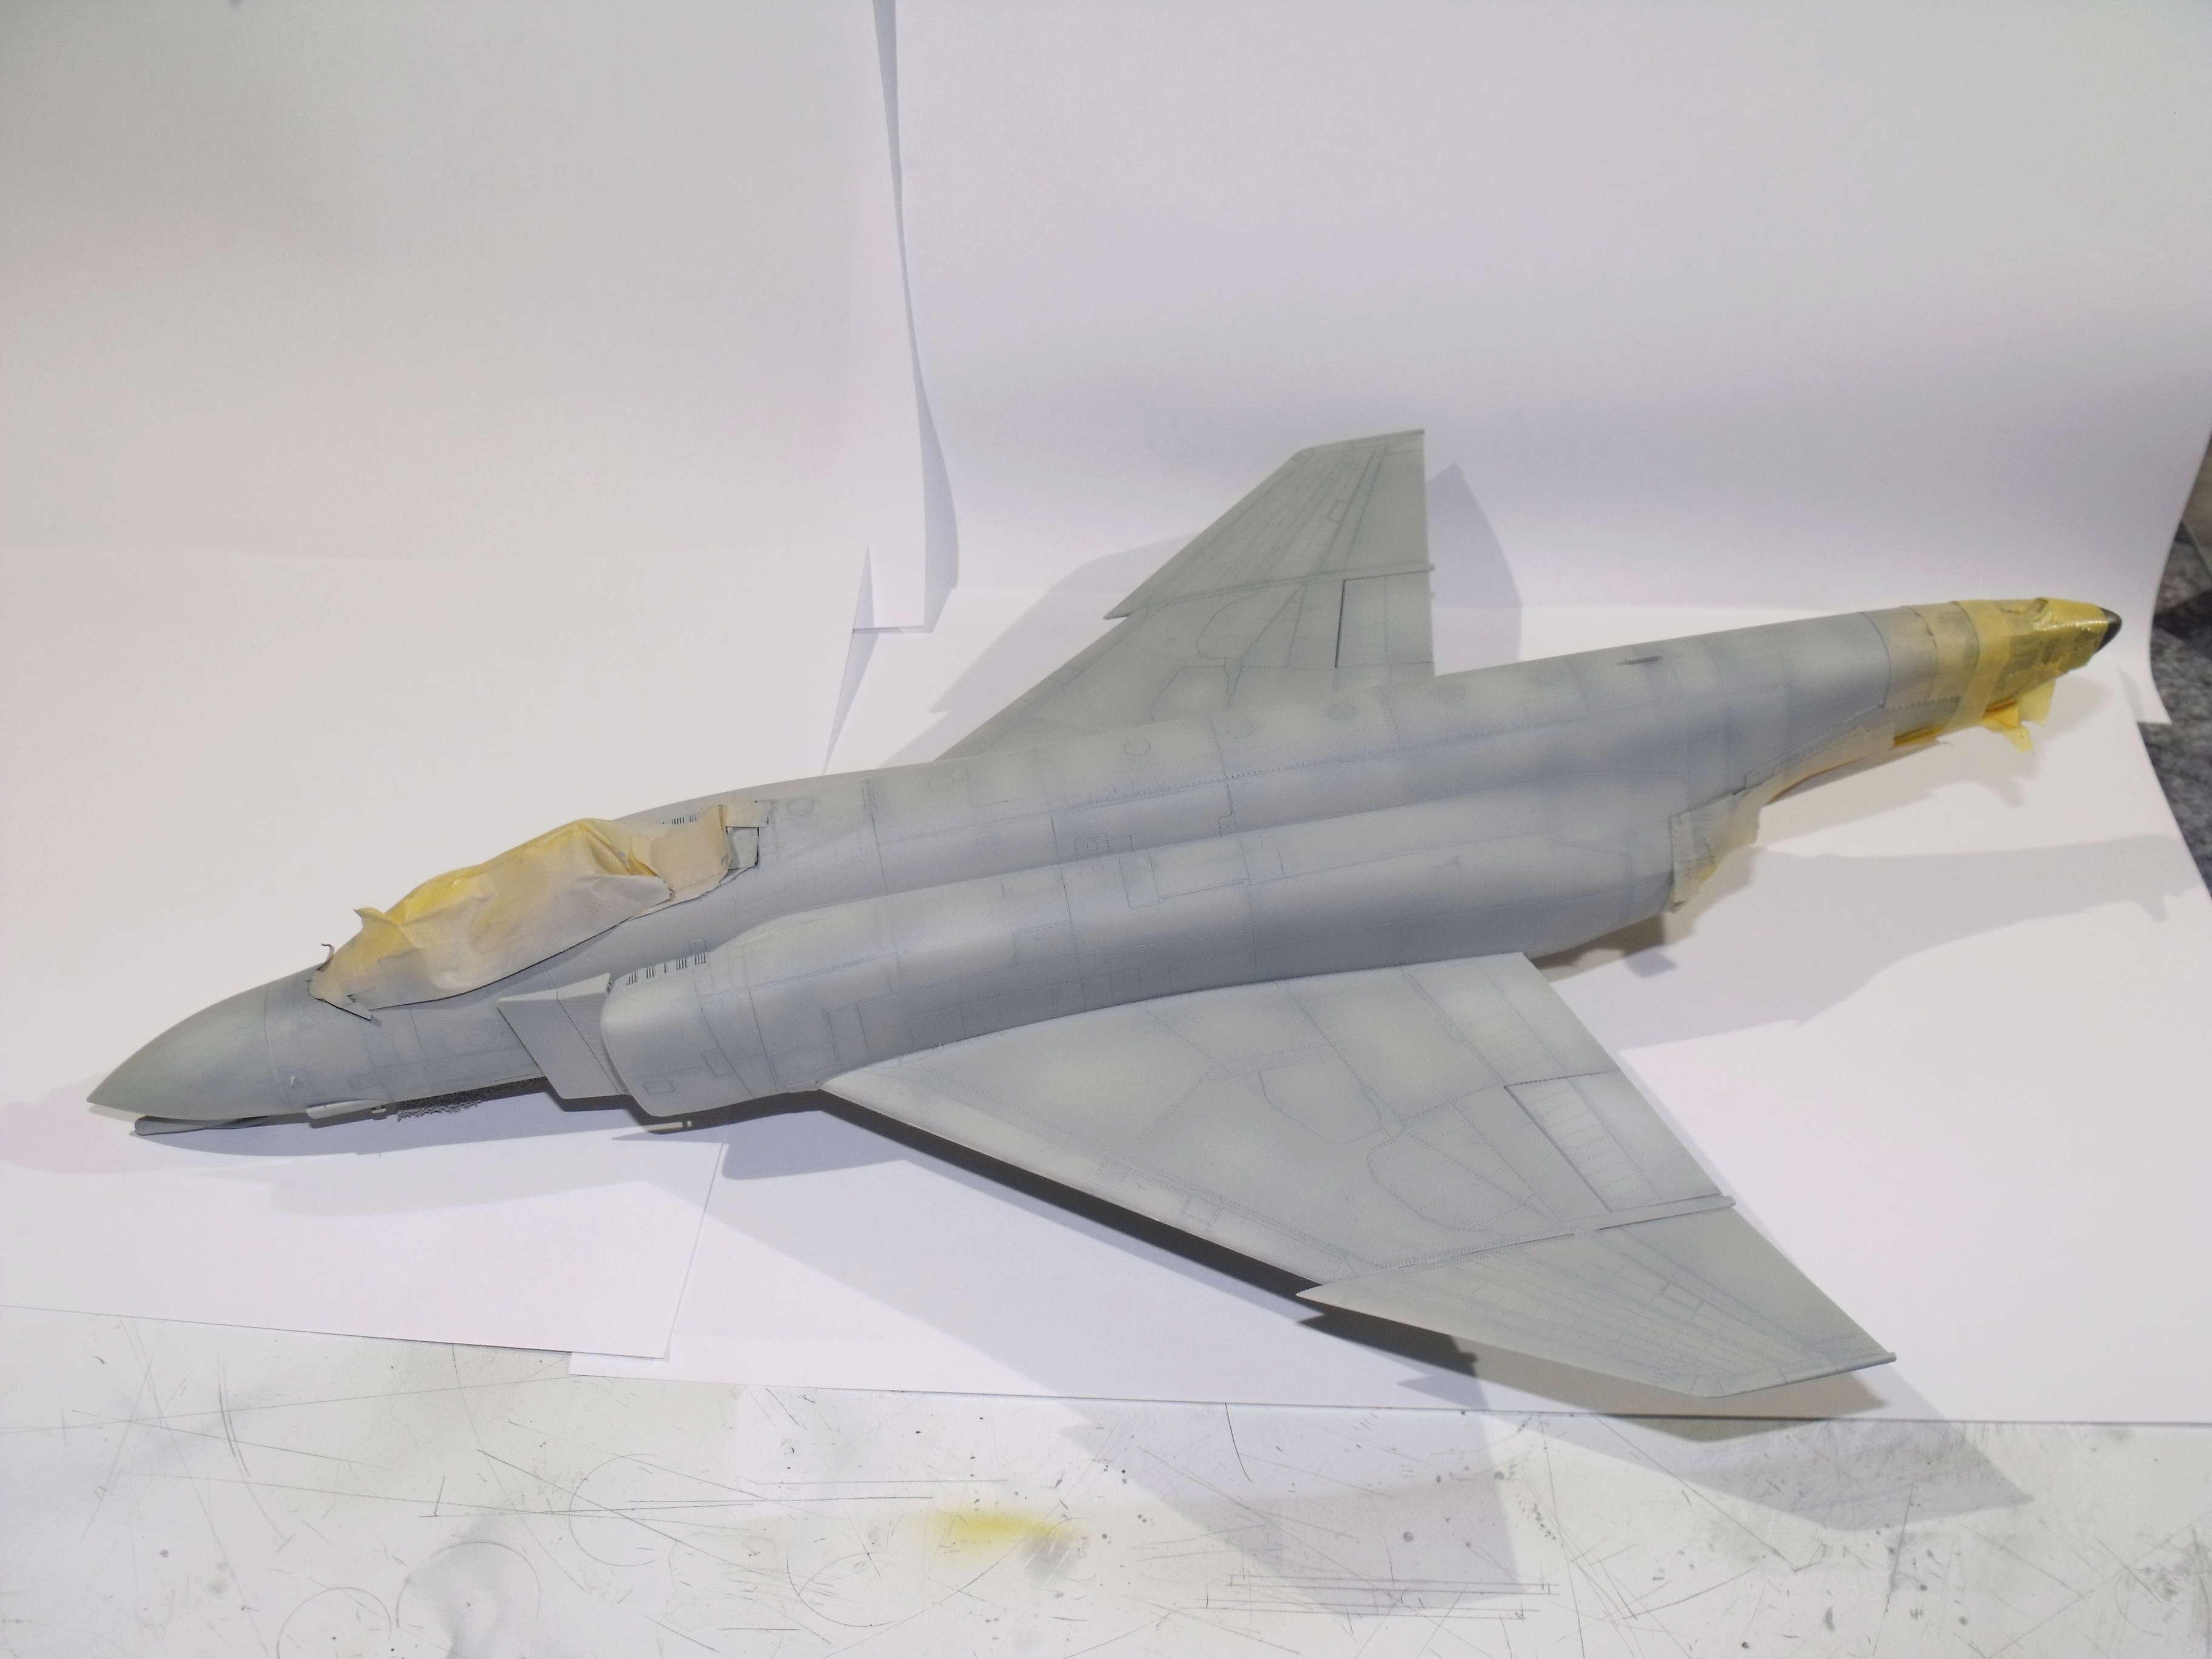 F-4 B Phantom 1/48° - VF-51 - 1972 - Début de patine. - Page 4 Dscf7039